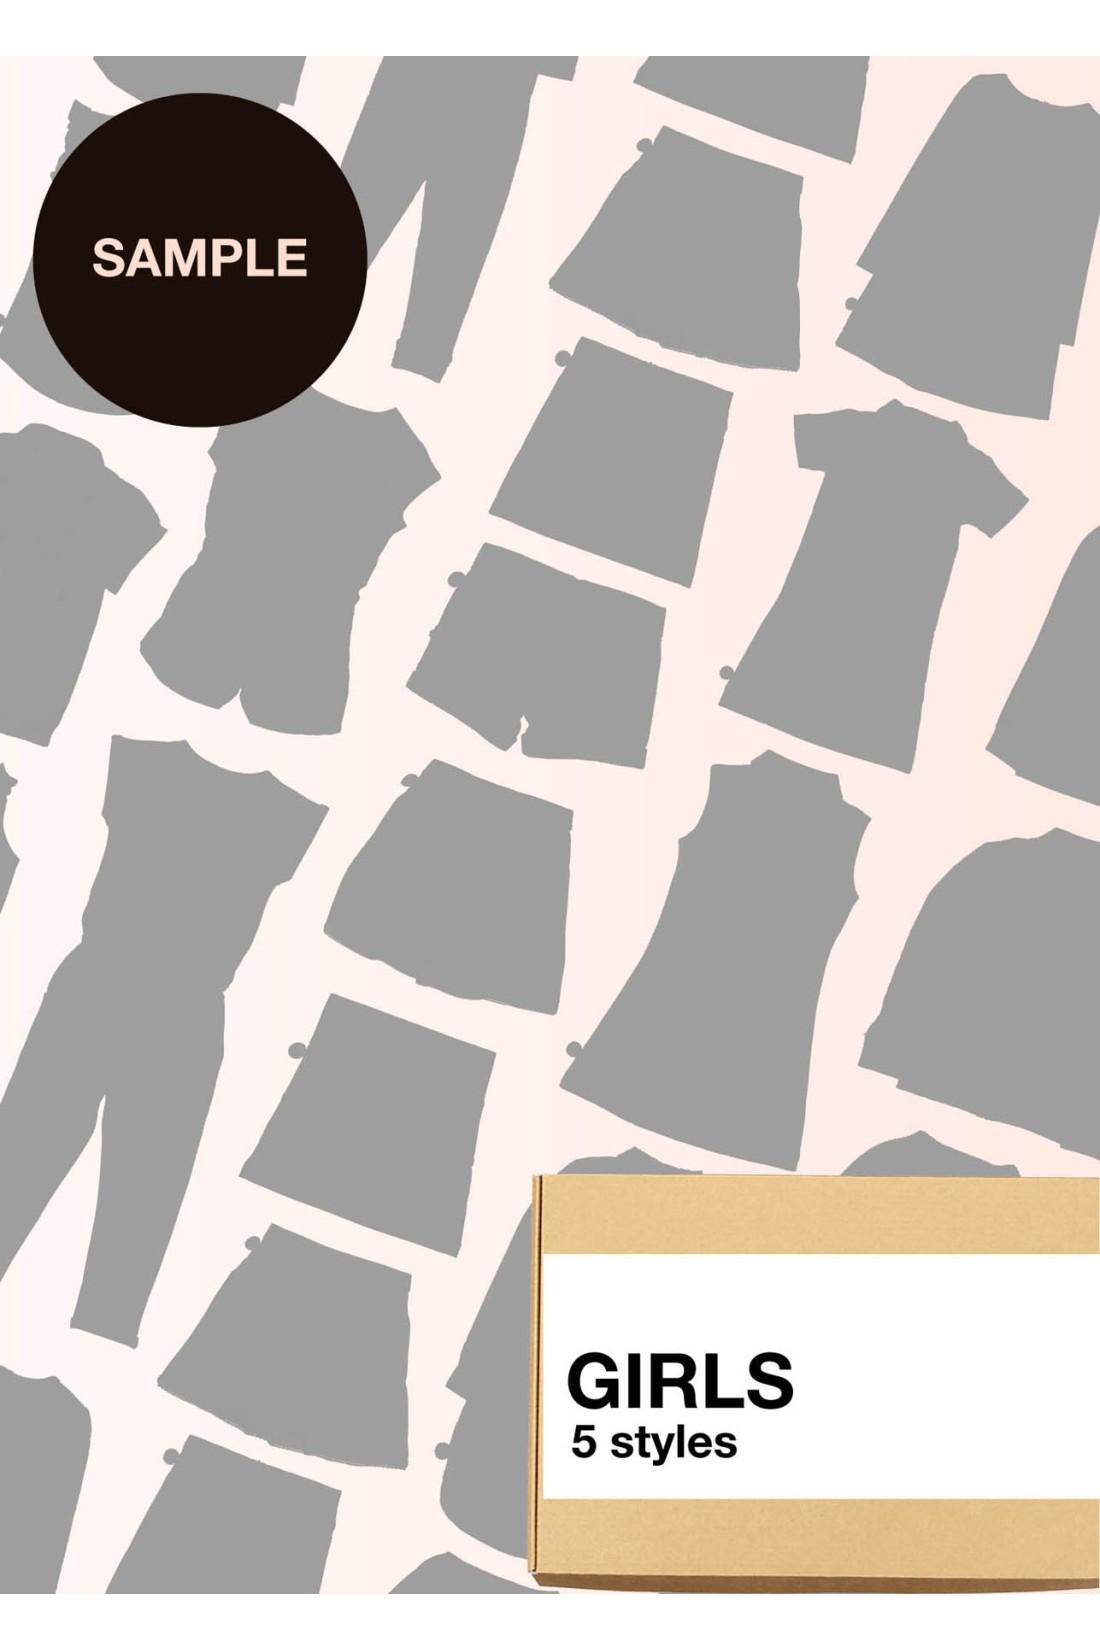 Sample Surprise Box Girls - 5 Styles